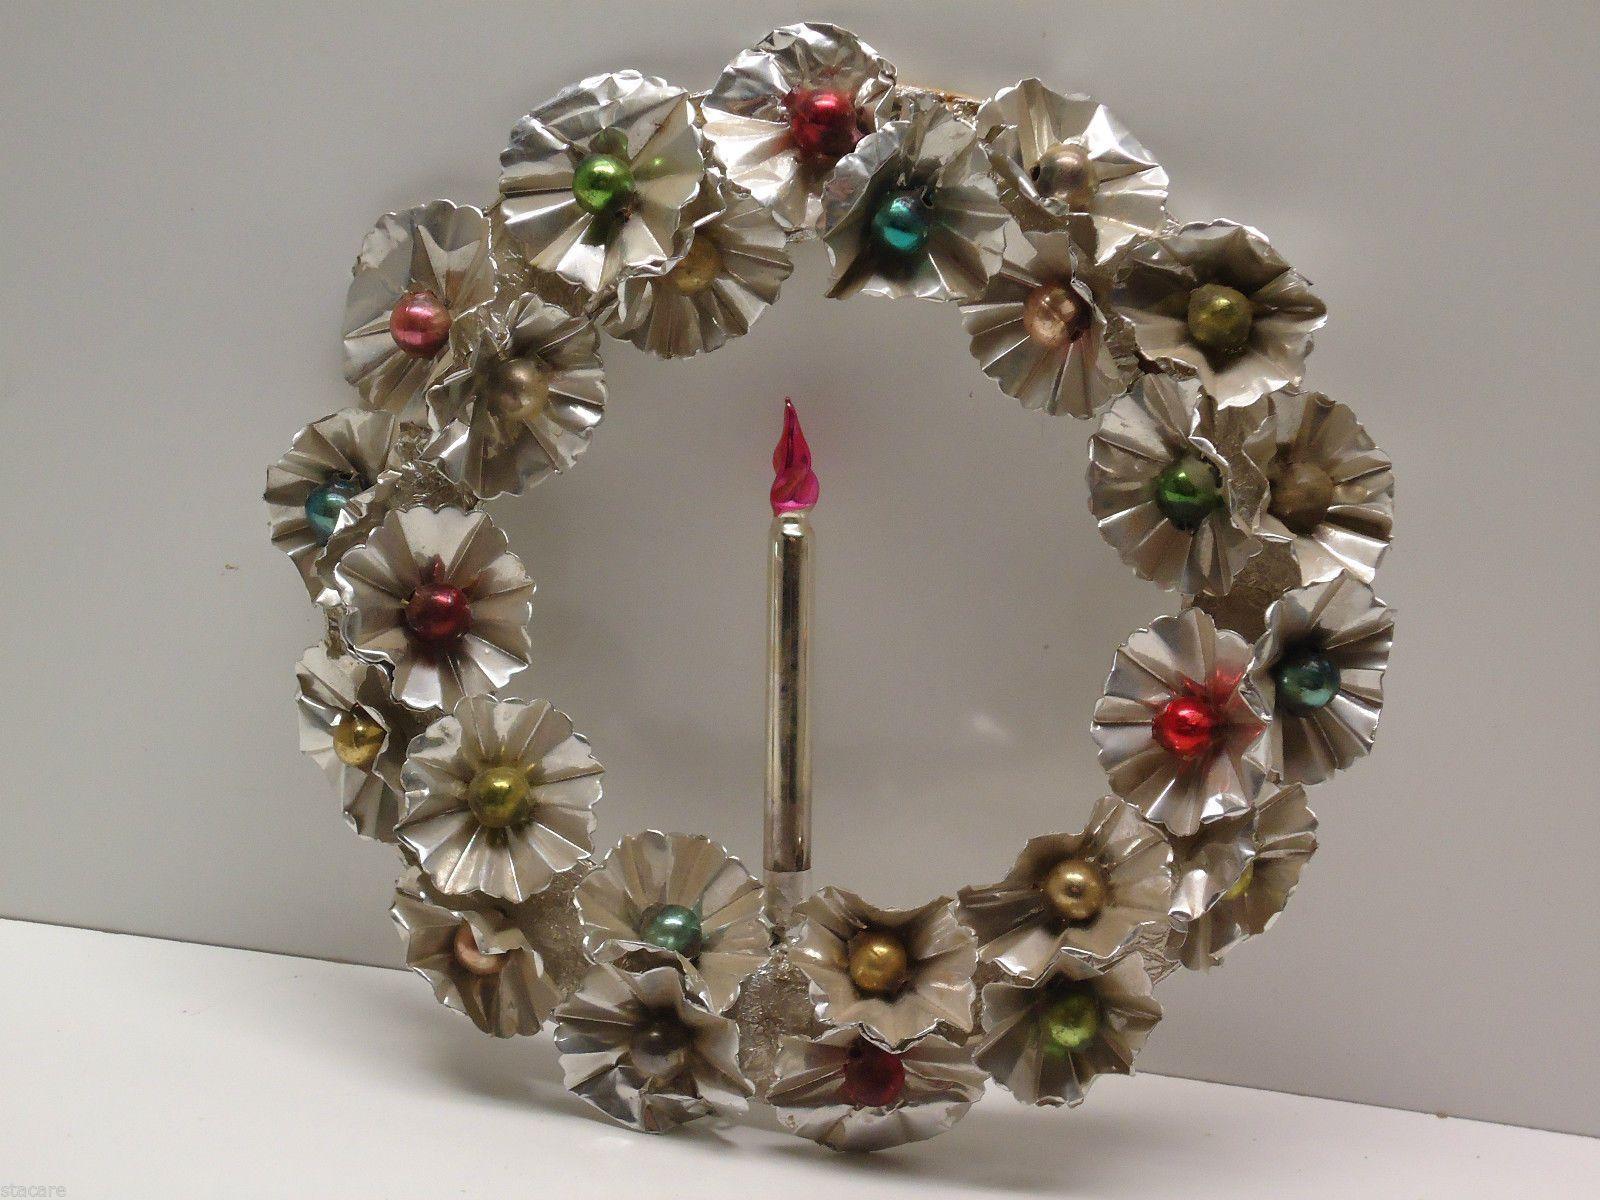 Mercury Balls Decorations Vintage Christmas Aluminum Tin Wreath With Candle Mercury Balls